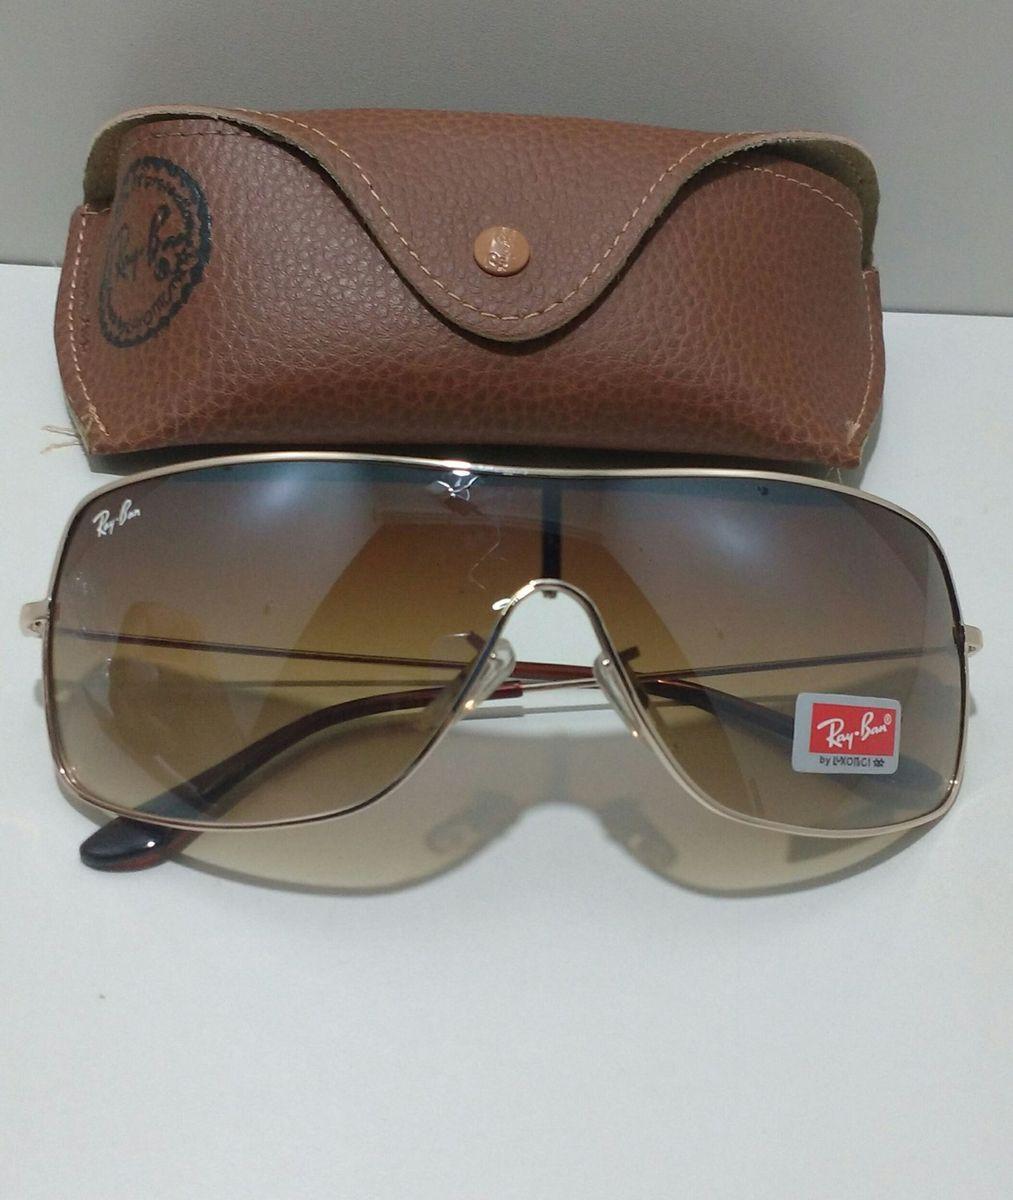 cb23a912a óculos rayban feminino - óculos ray-ban.  Czm6ly9wag90b3muzw5qb2vplmnvbs5ici9wcm9kdwn0cy84nze3mjezl2q4mdcwyjuwmjc0mdk0yzrjmwexodlhywywogiyymexlmpwzw